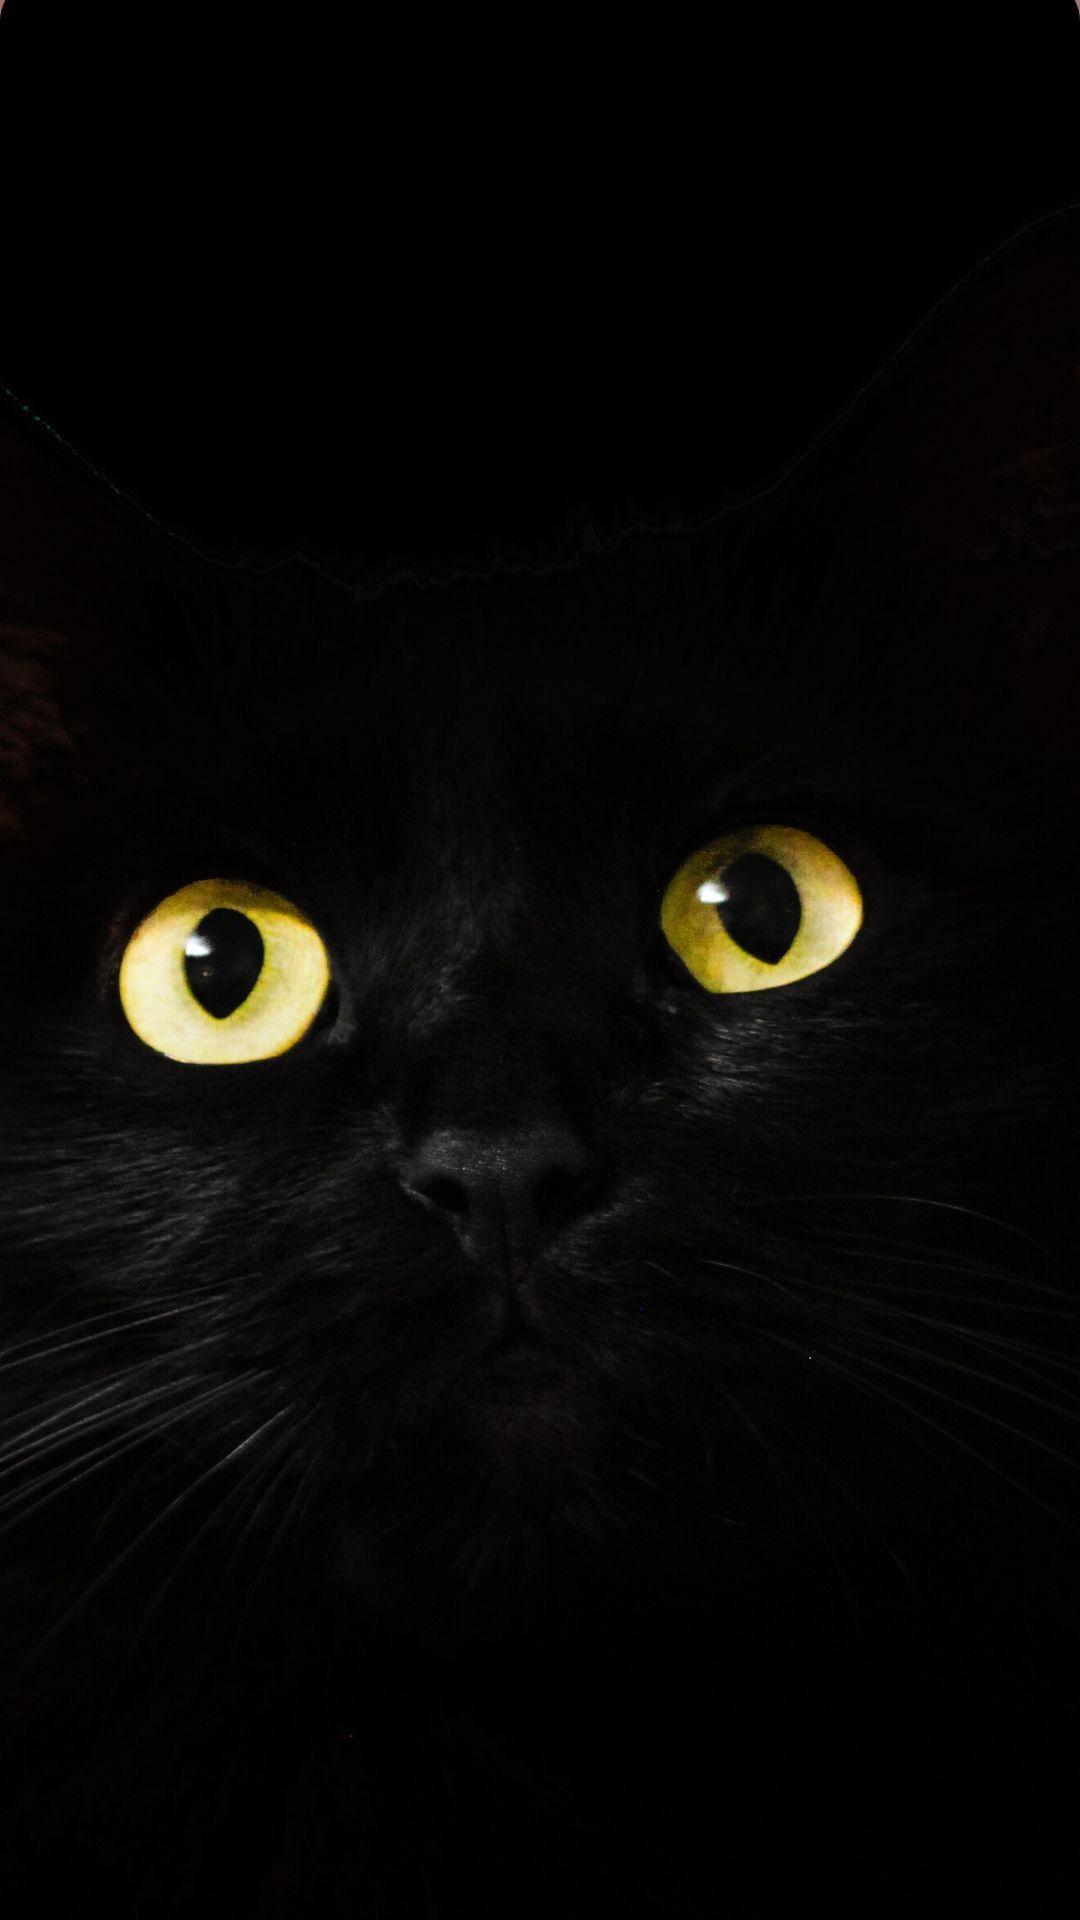 Cute Wallpapers Black Cat